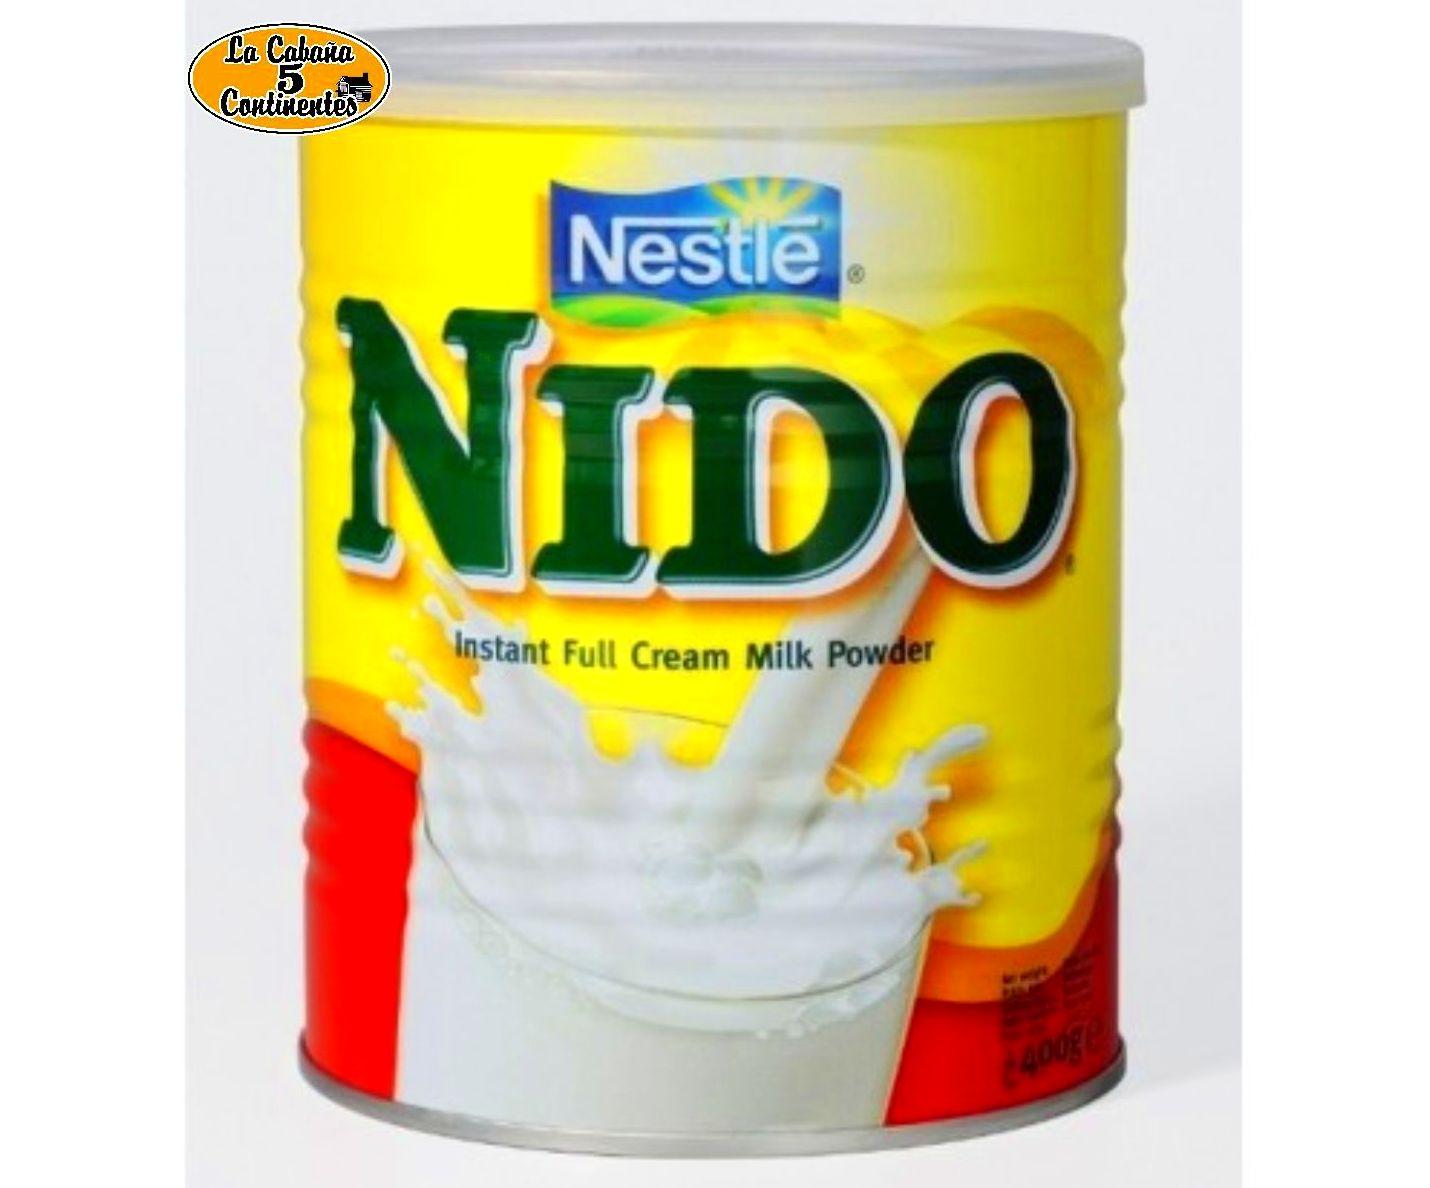 leche nido: PRODUCTOS de La Cabaña 5 continentes